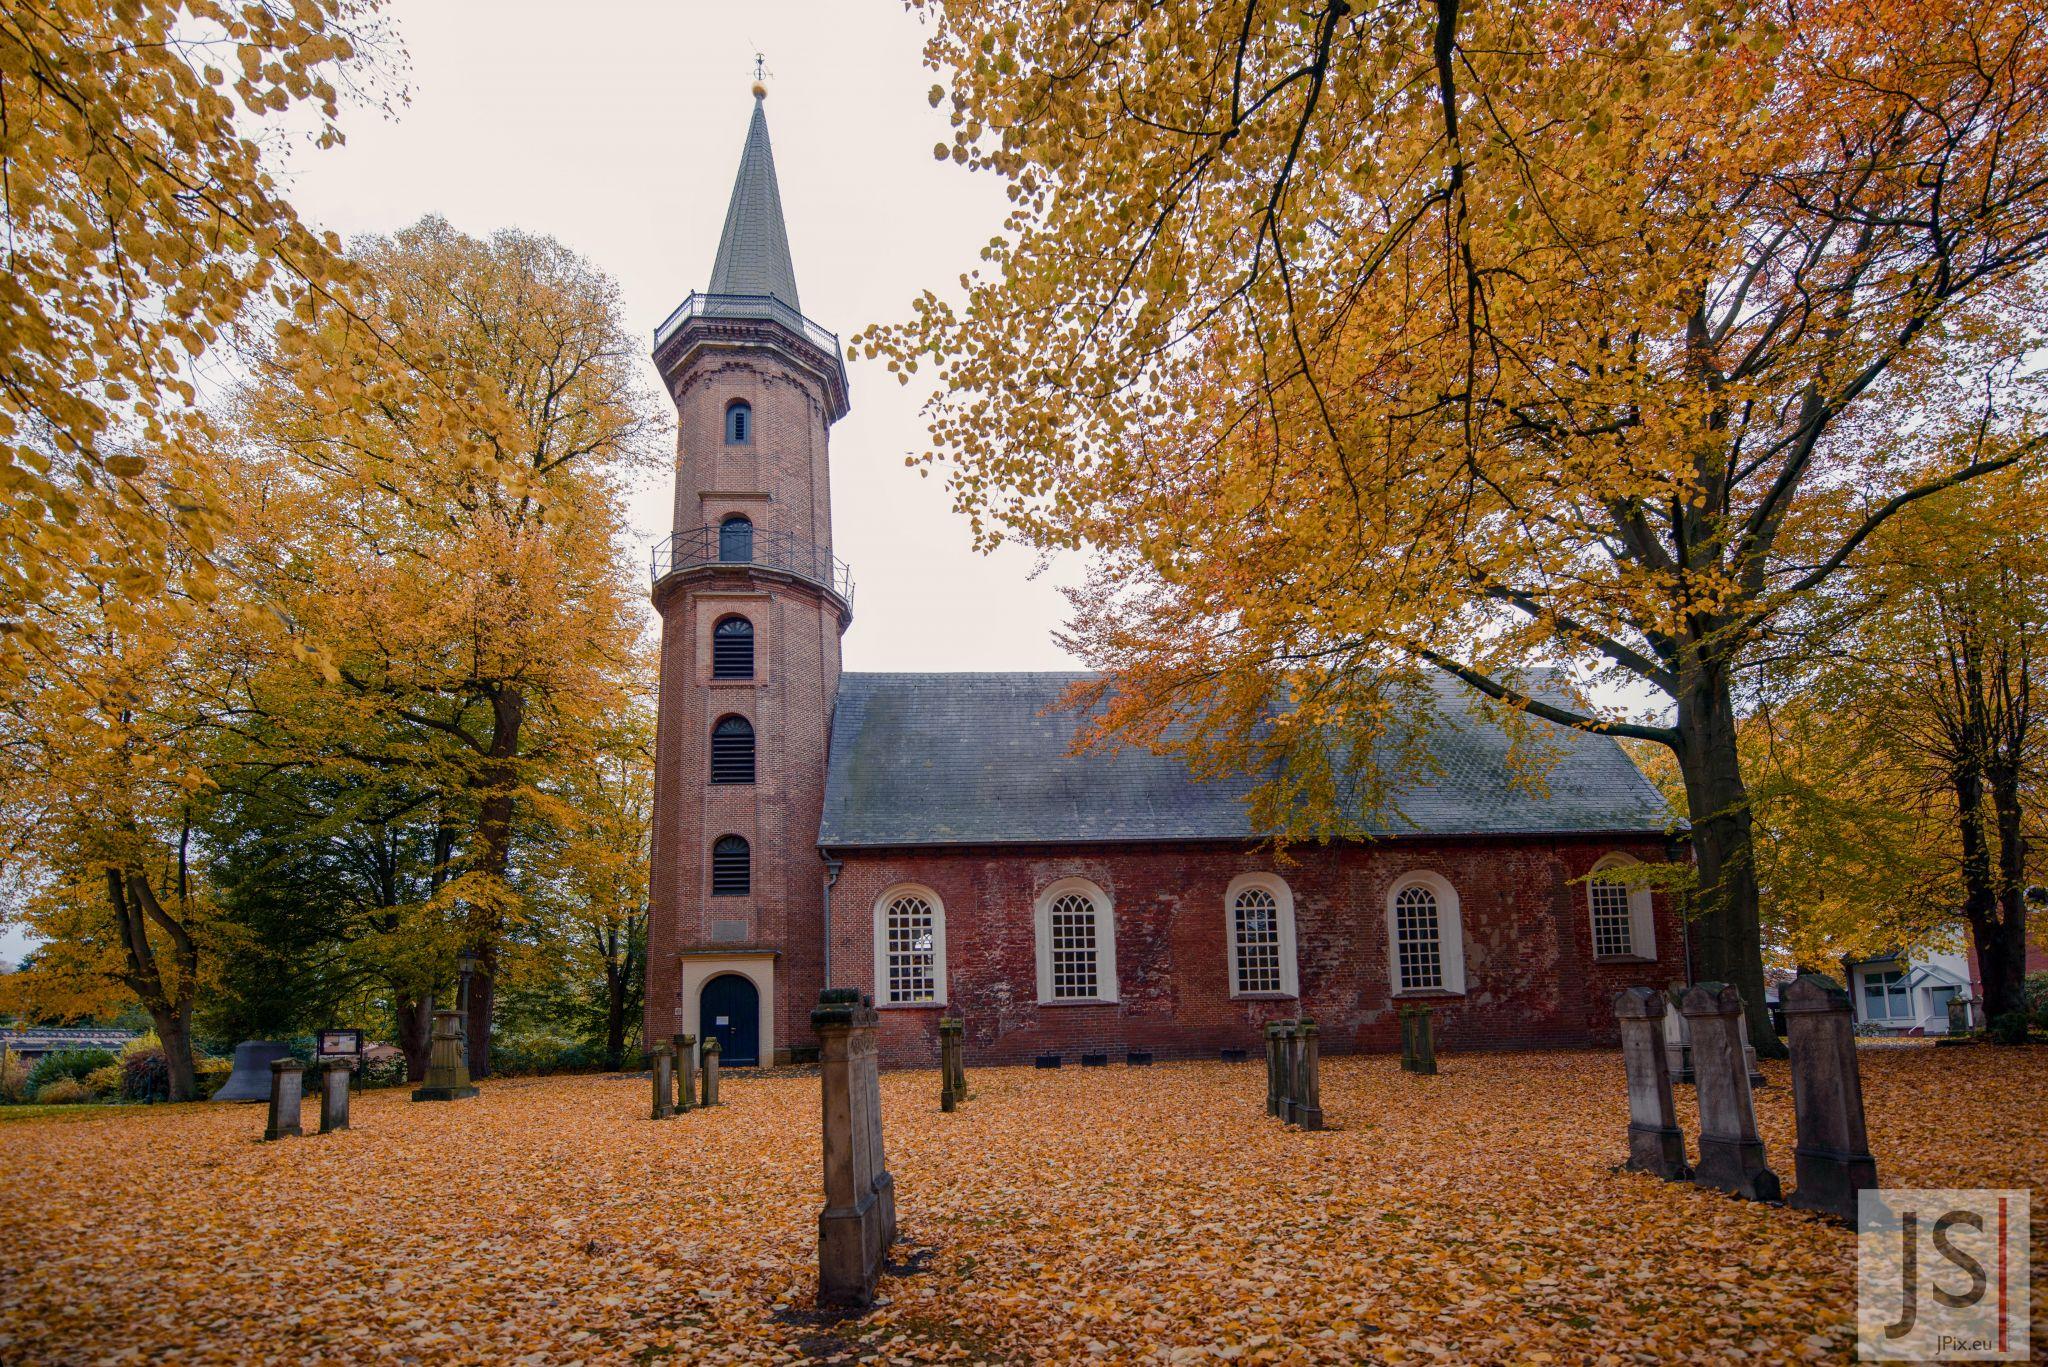 Evangelisch-reformierte Kirche in Leer-Loga, Germany